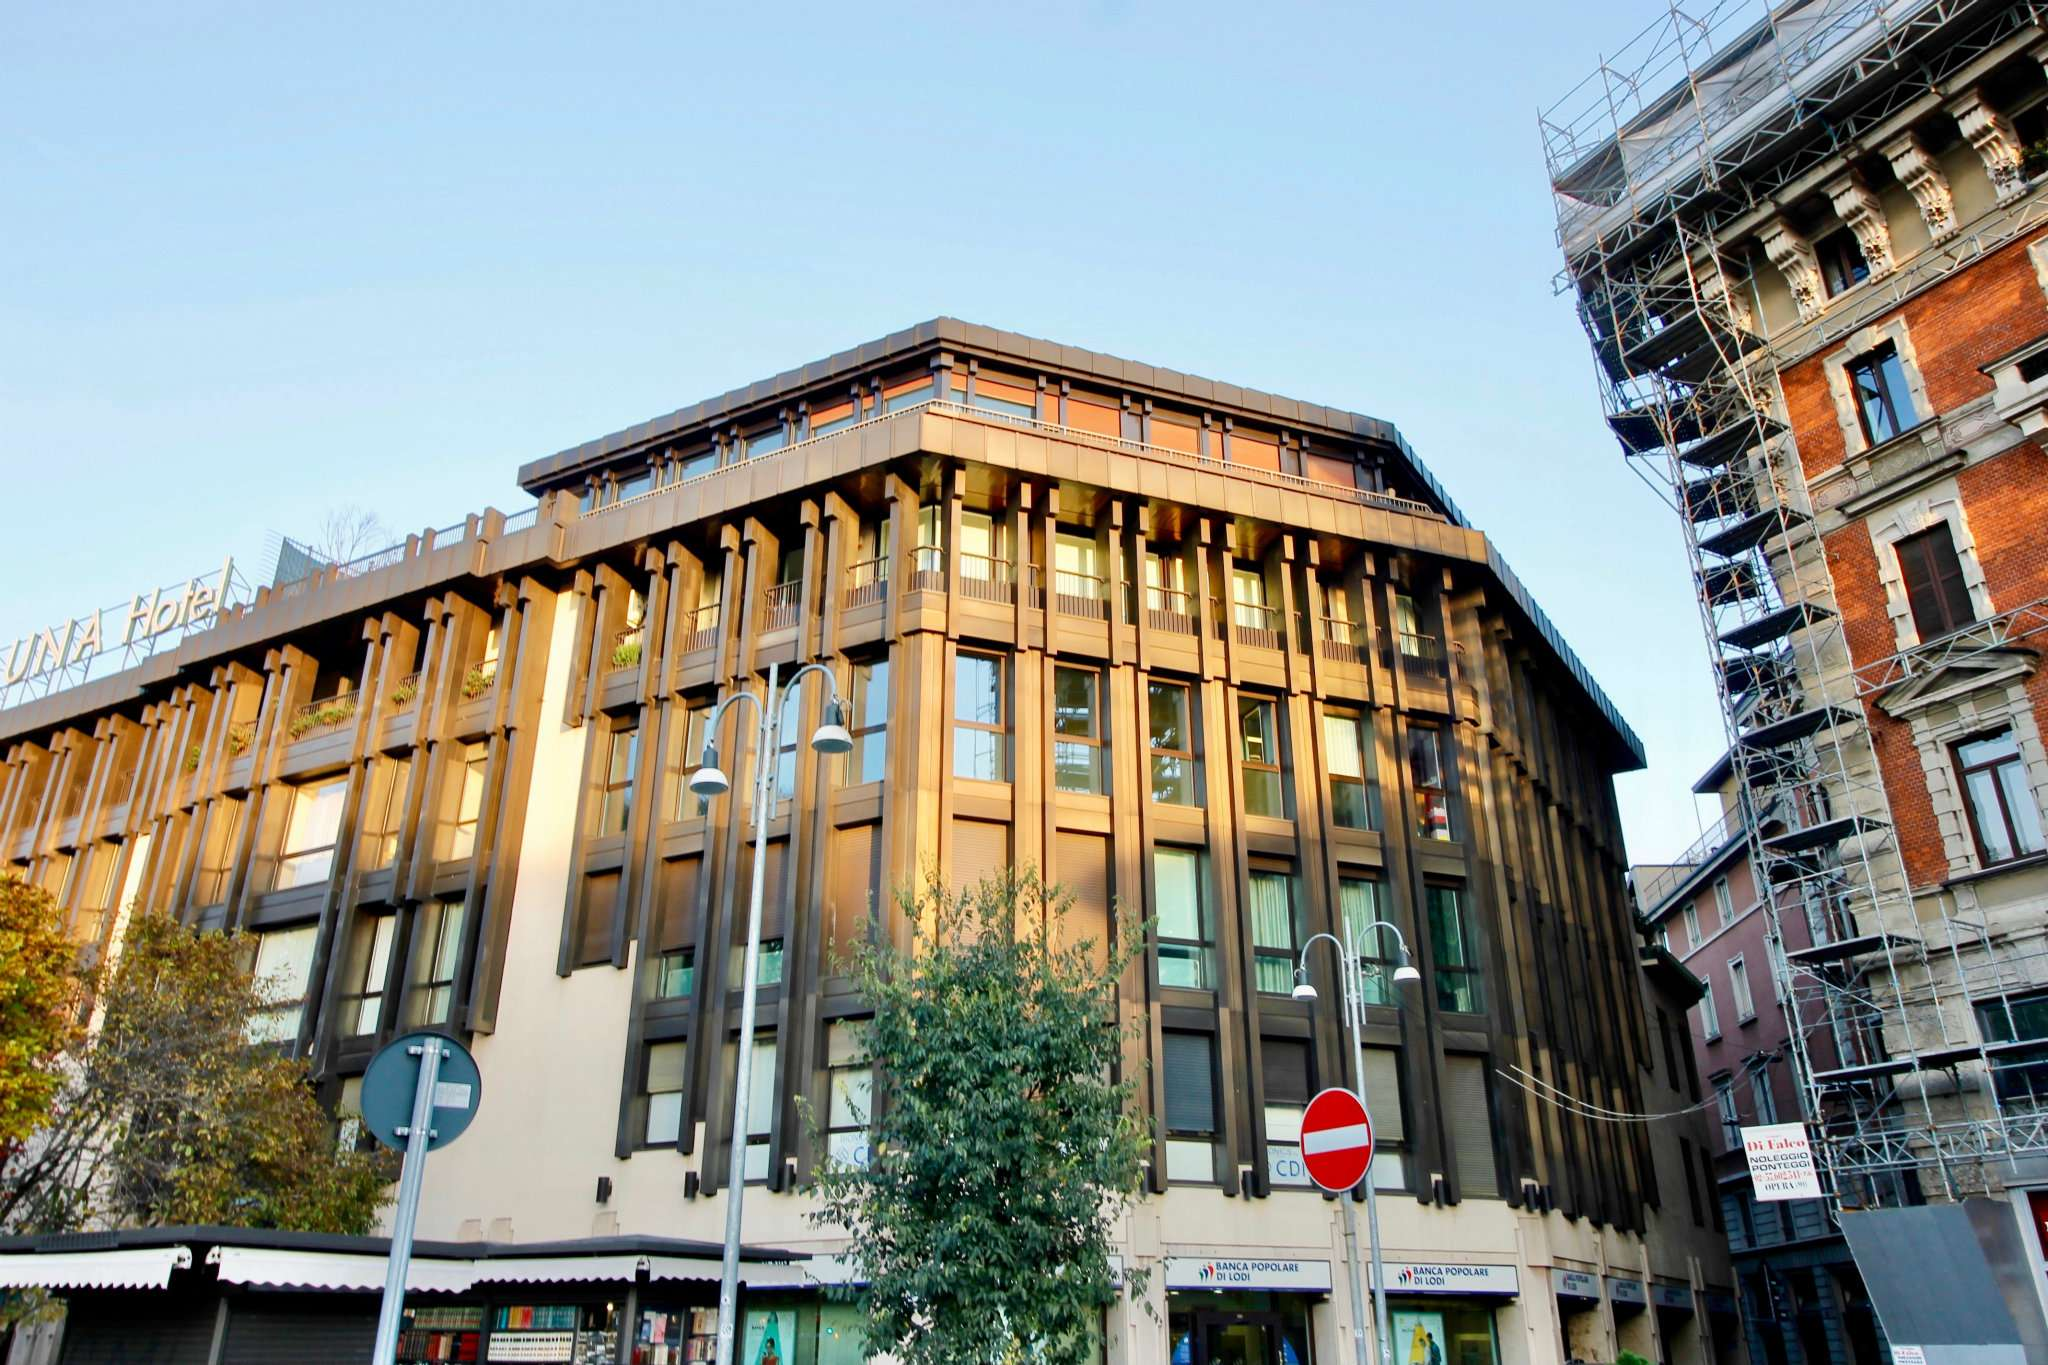 Appartamento in vendita a milano largo cairoli trovocasa for Casa milano vendita